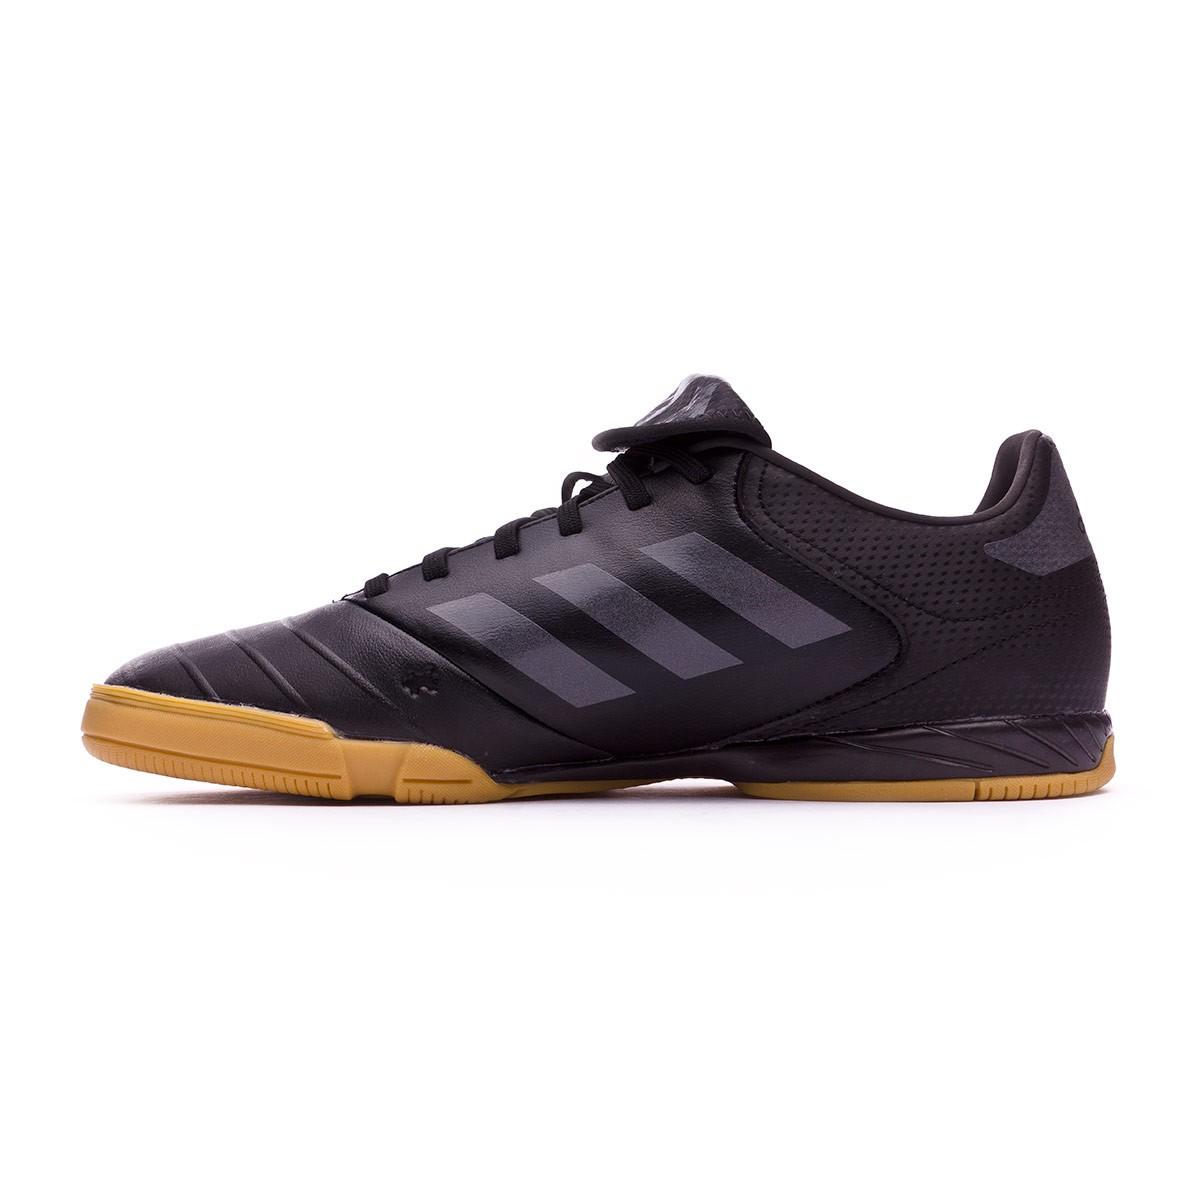 60c5a9dde Futsal Boot adidas Copa Tango 18.3 IN Core black-Utility black - Football  store Fútbol Emotion